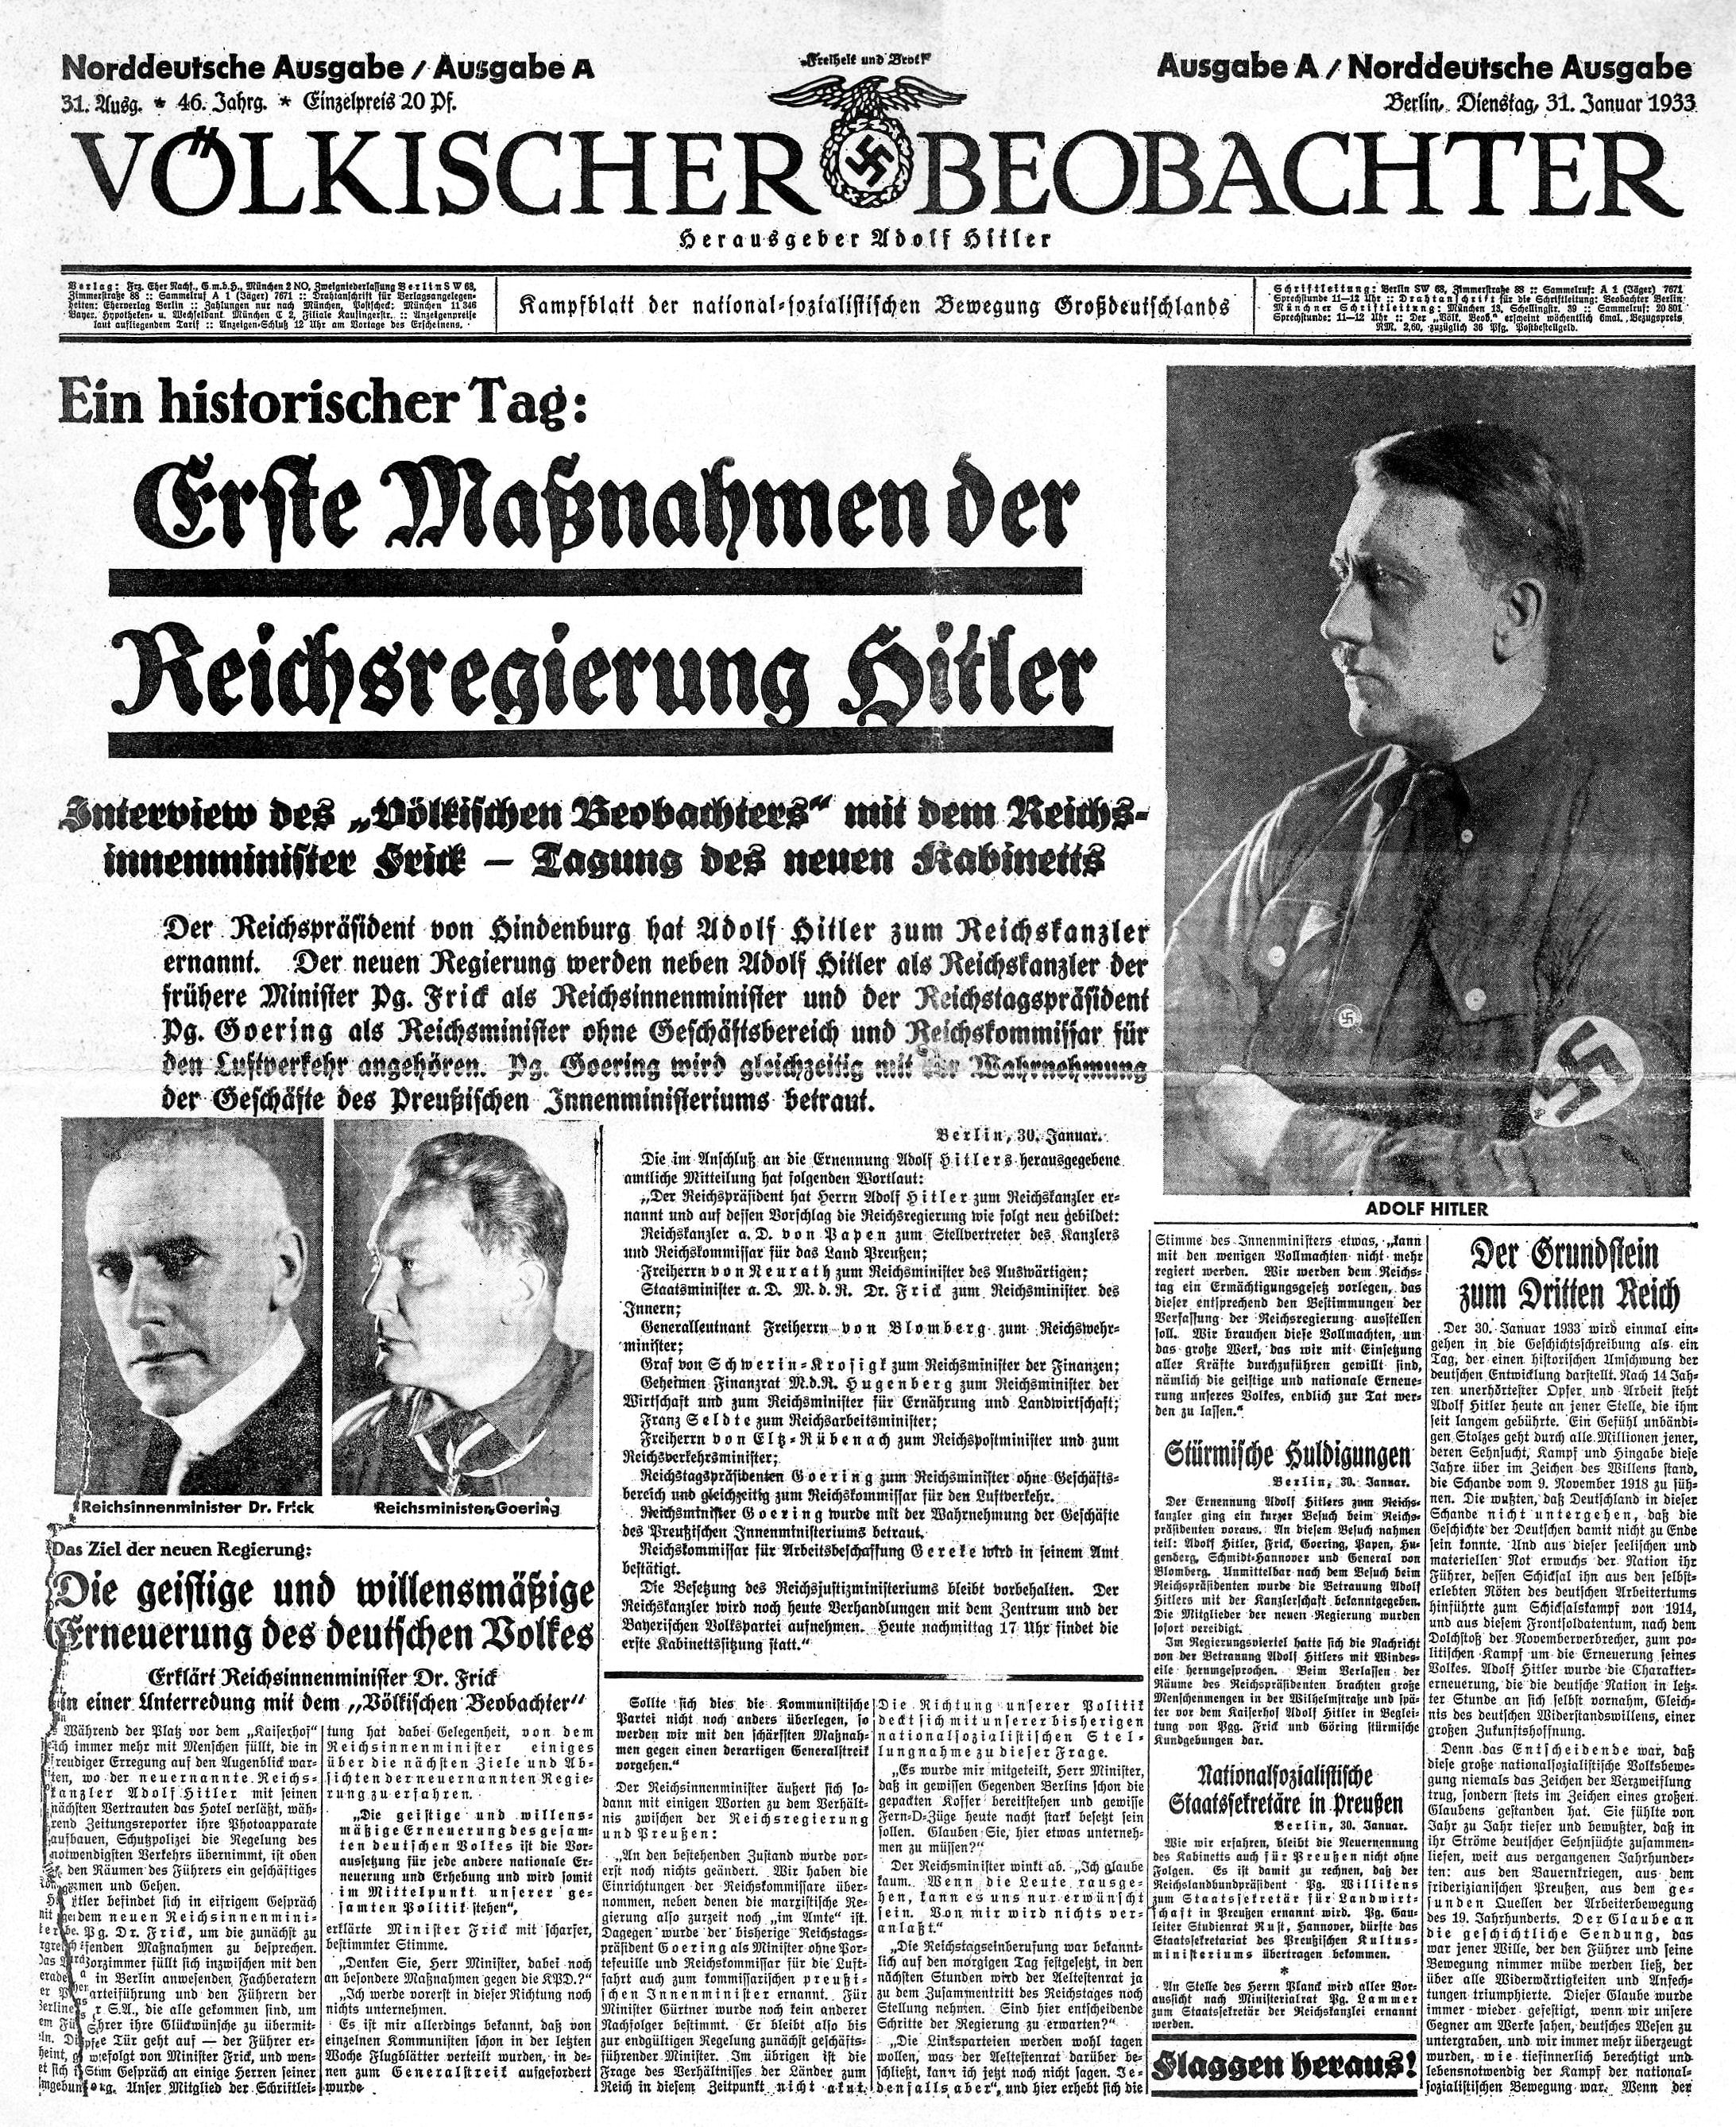 Nazi Newspaper Propaganda Fdbfdbcdabced Nazi Newspaper Propaganda